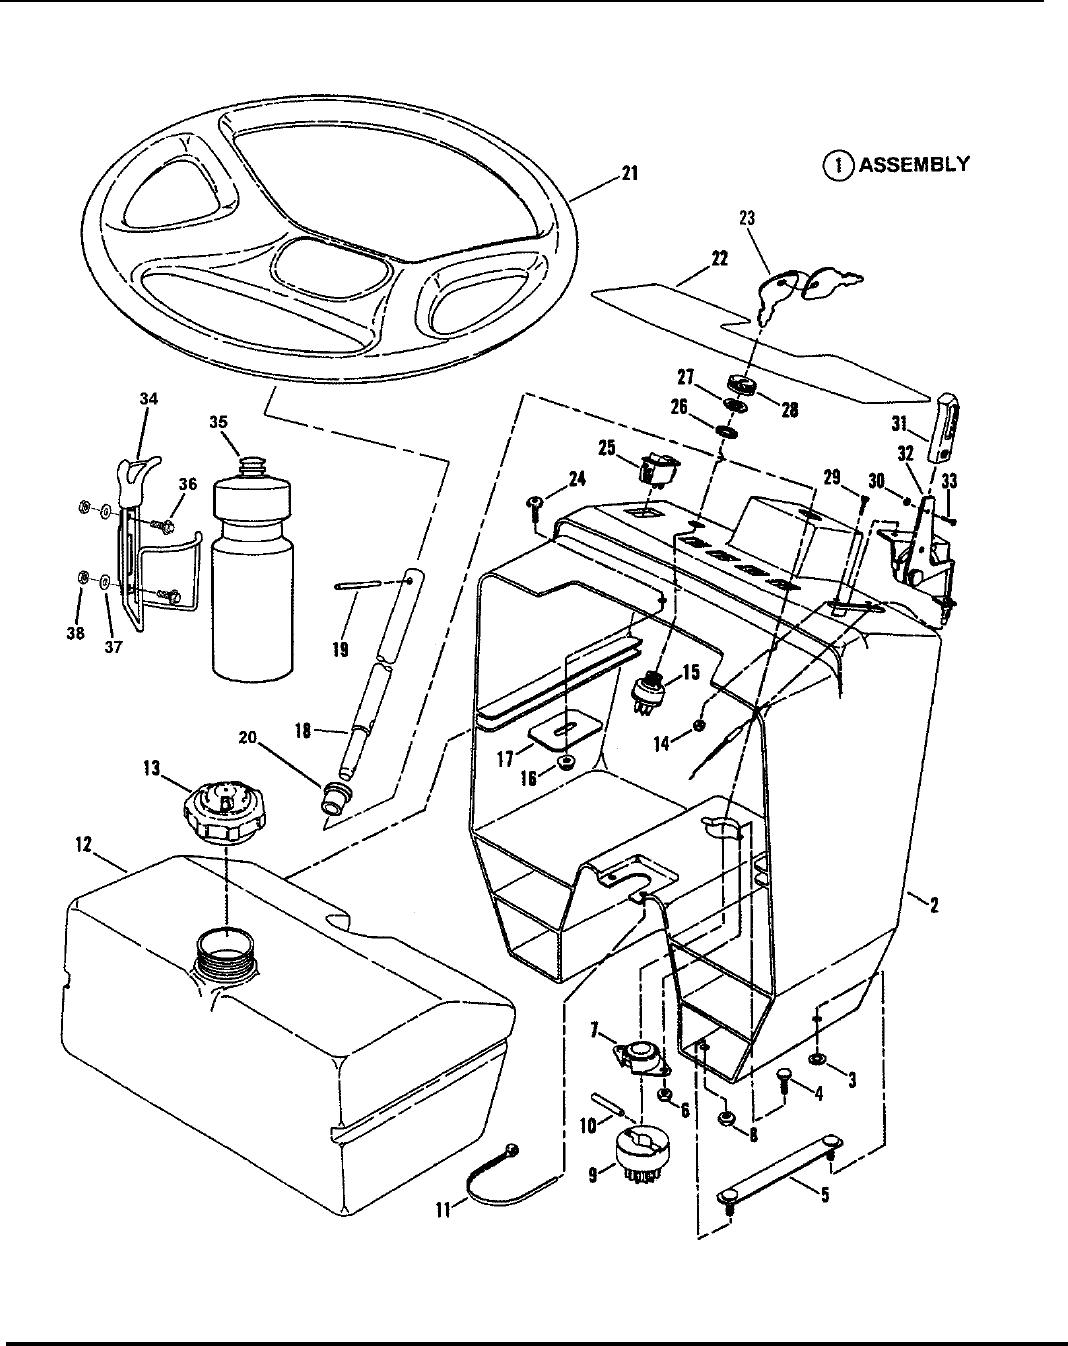 PartsManual ELT180H33IBV Lawn 5